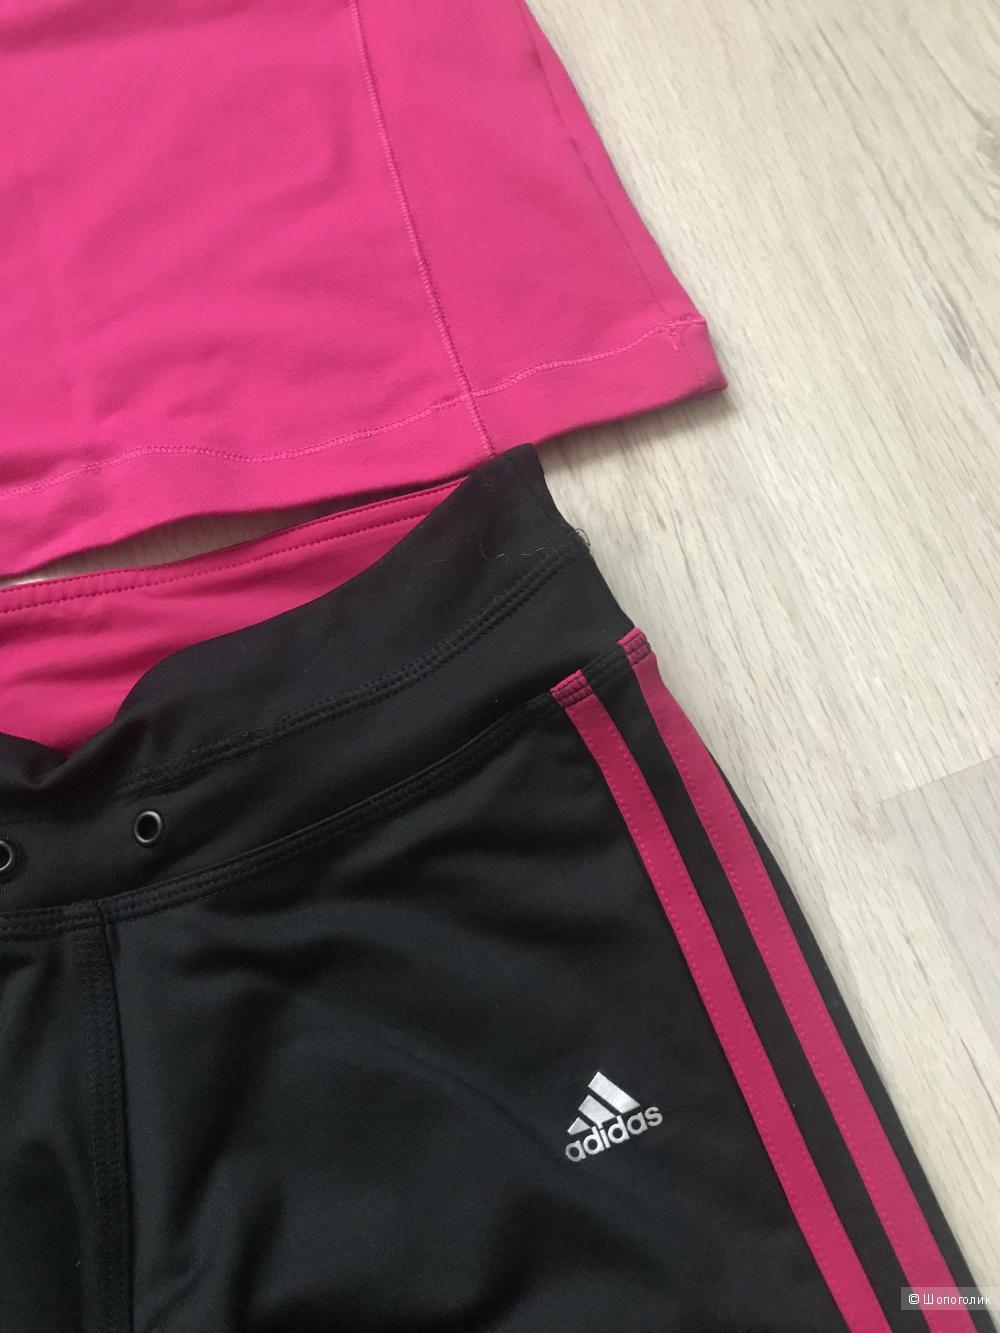 Комплект Adidas, размер XS, S